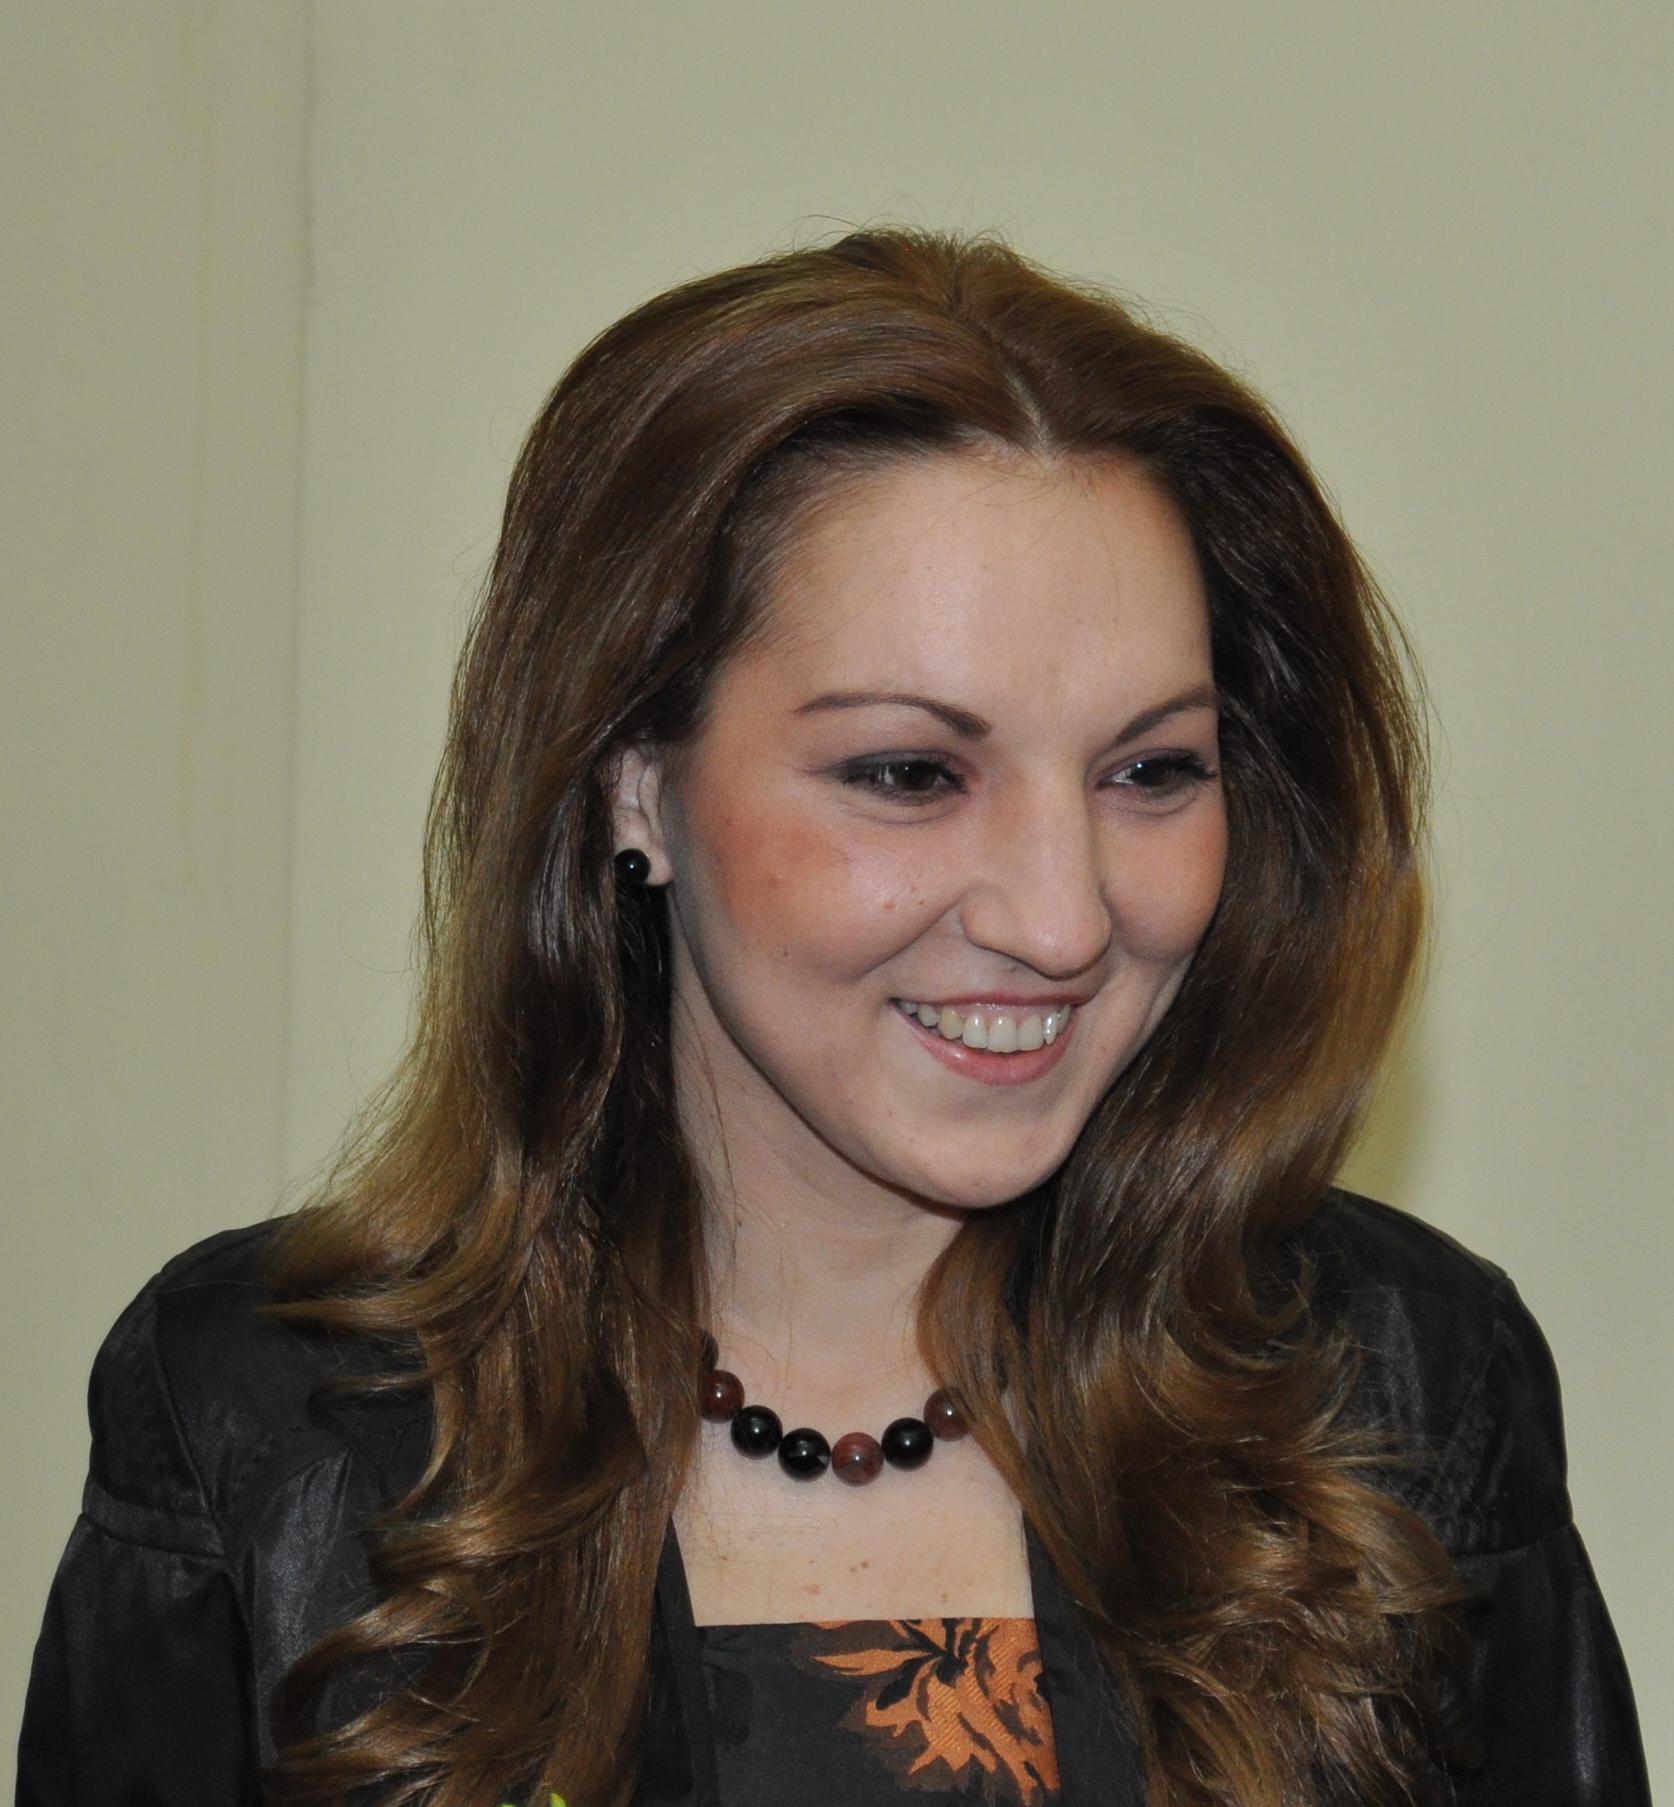 Psiholog Loredana Andrei Ionascu